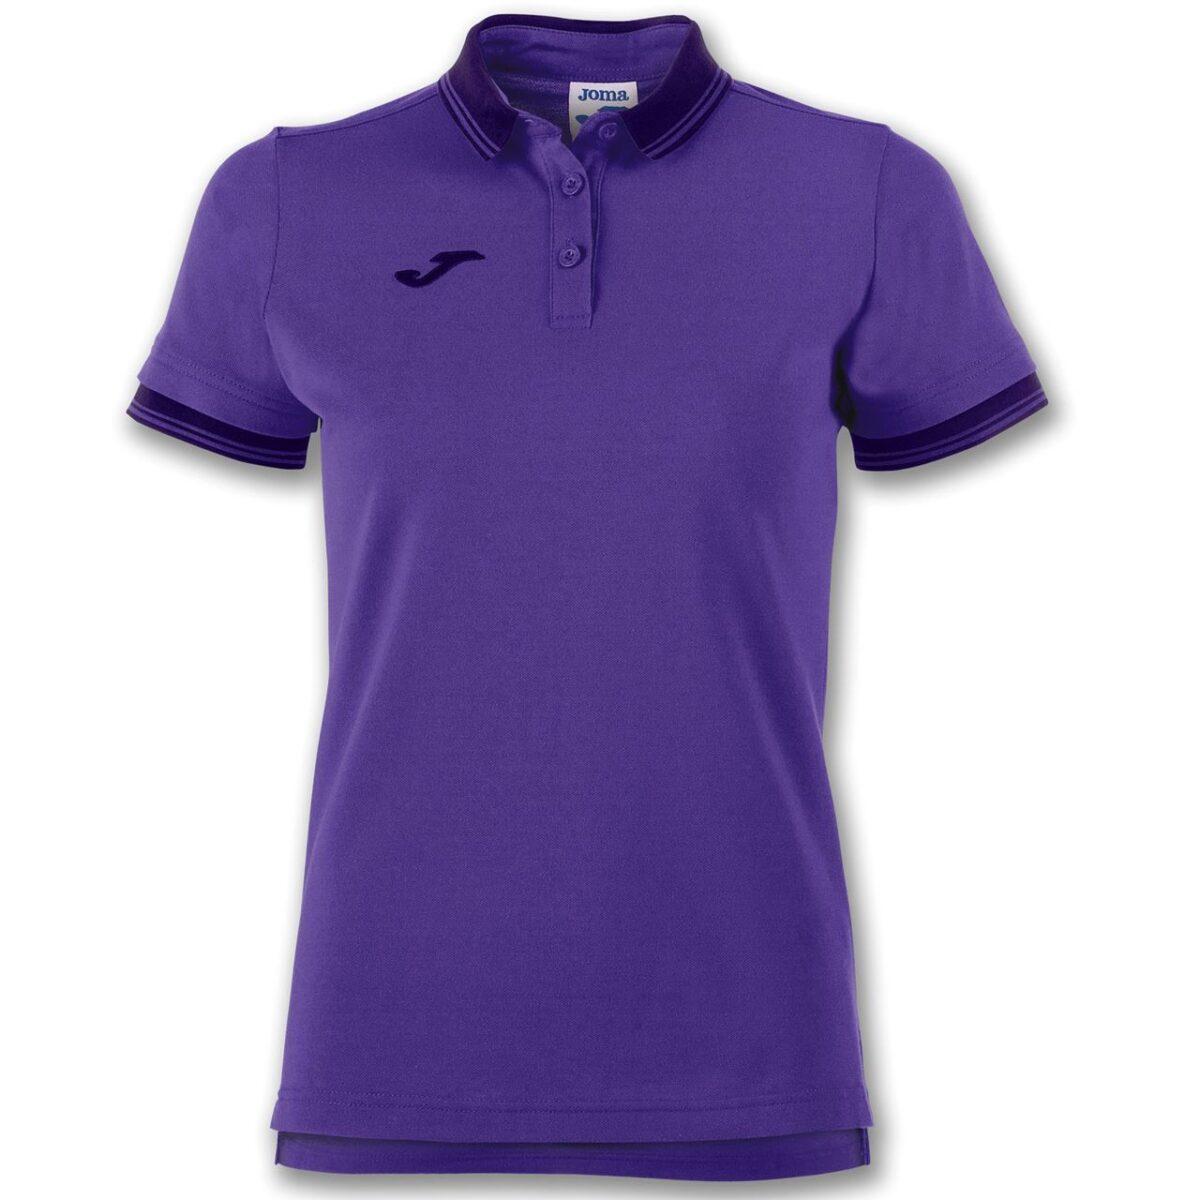 Joma Bali II Polo Shirt 900444 - Girls